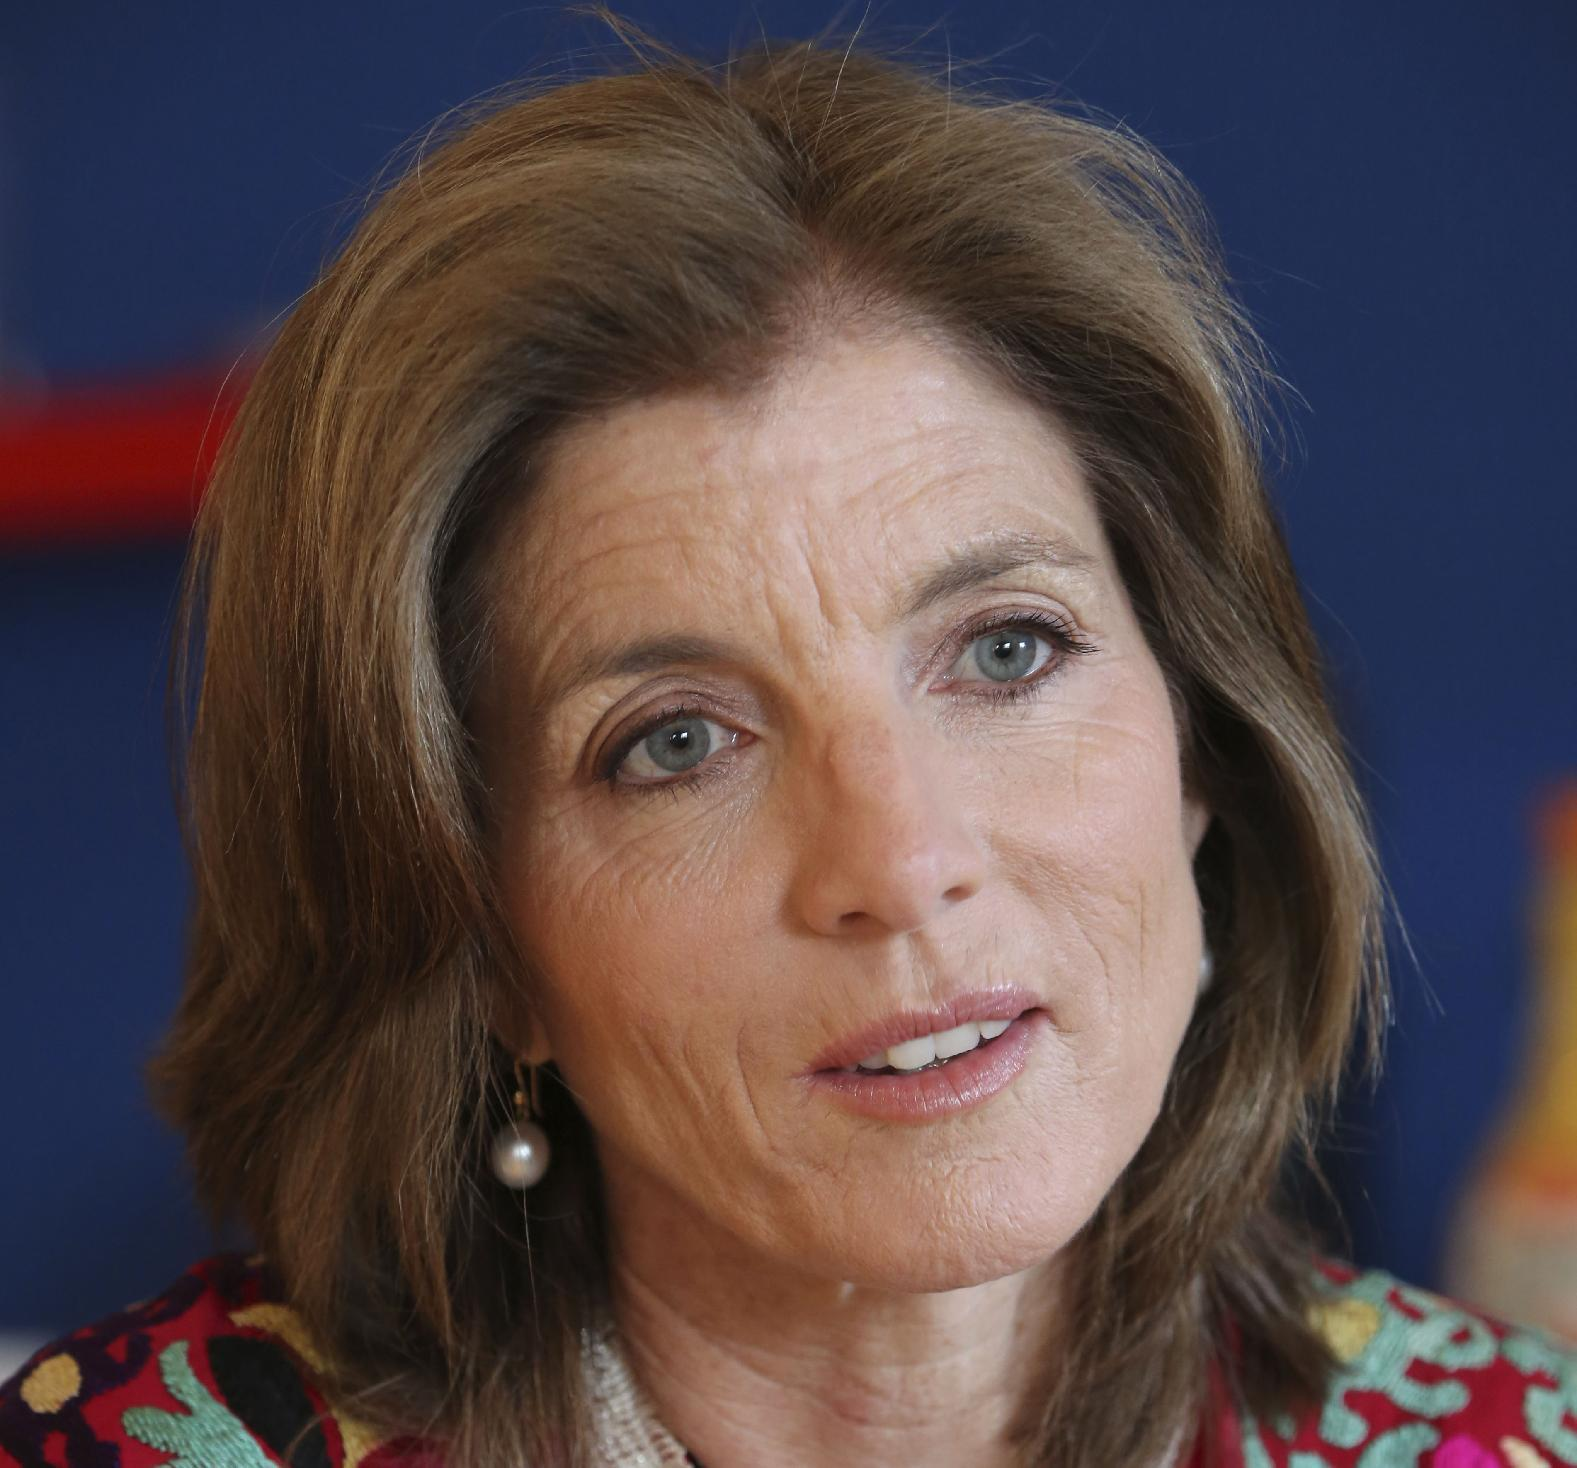 Caroline Kennedy Nominated As Ambassador To Japan